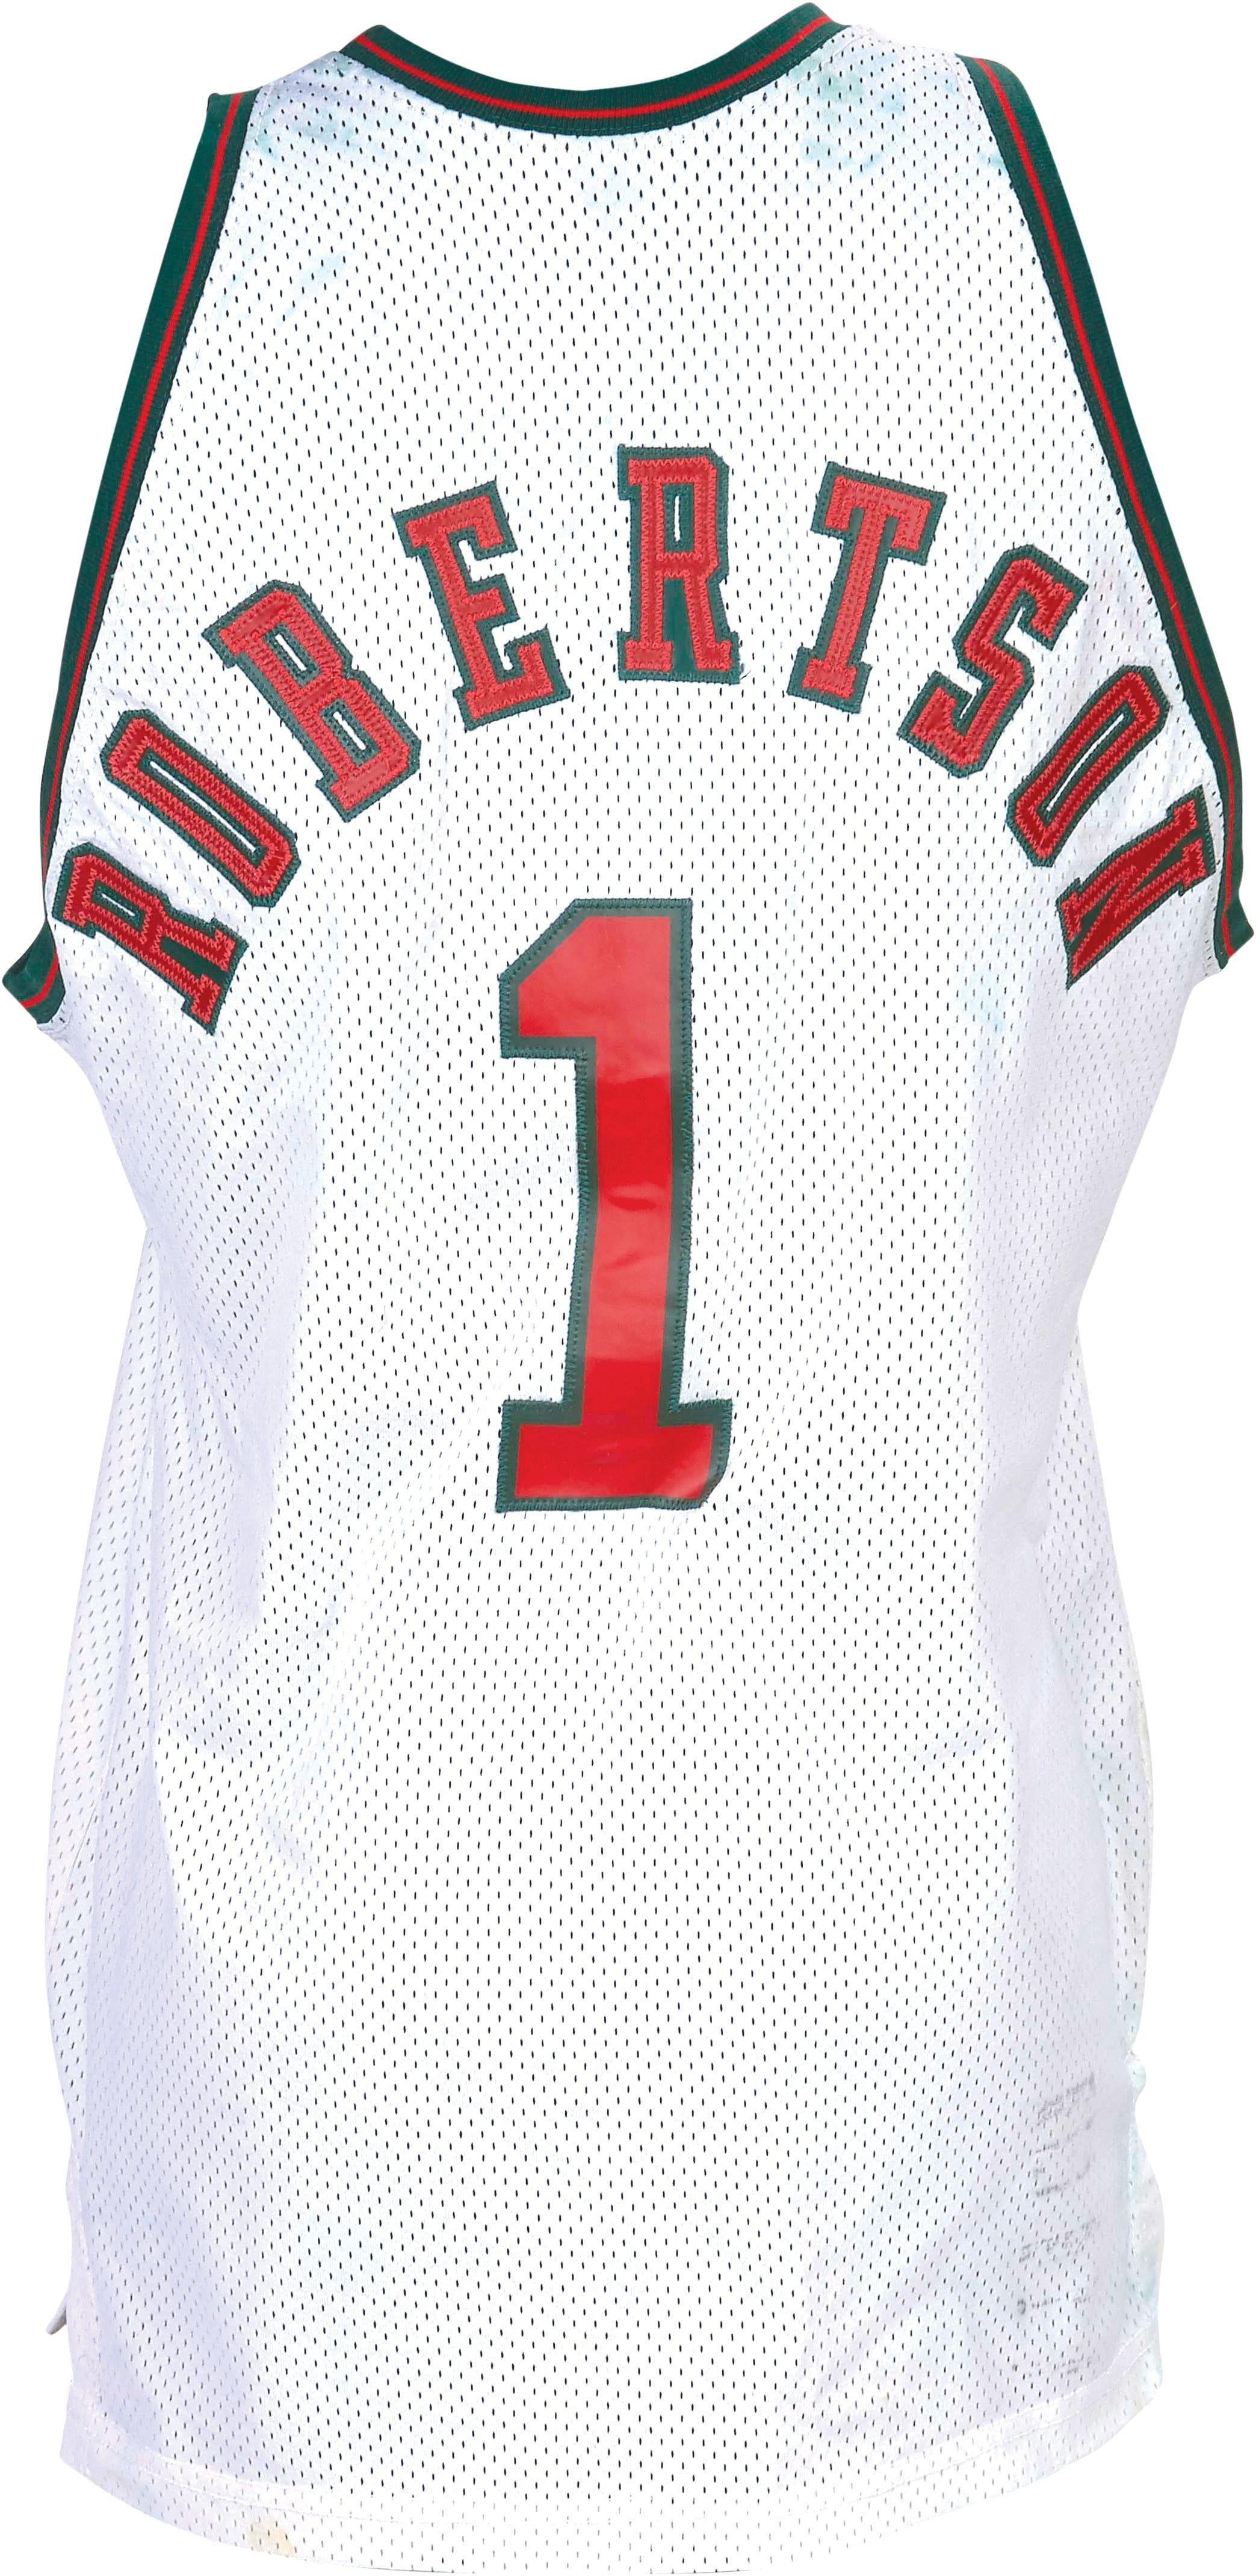 cfd3096fae0 636674134077905714-1973-74-Oscar-Robertson-Bucks-game-worn-jersey-back.jpg